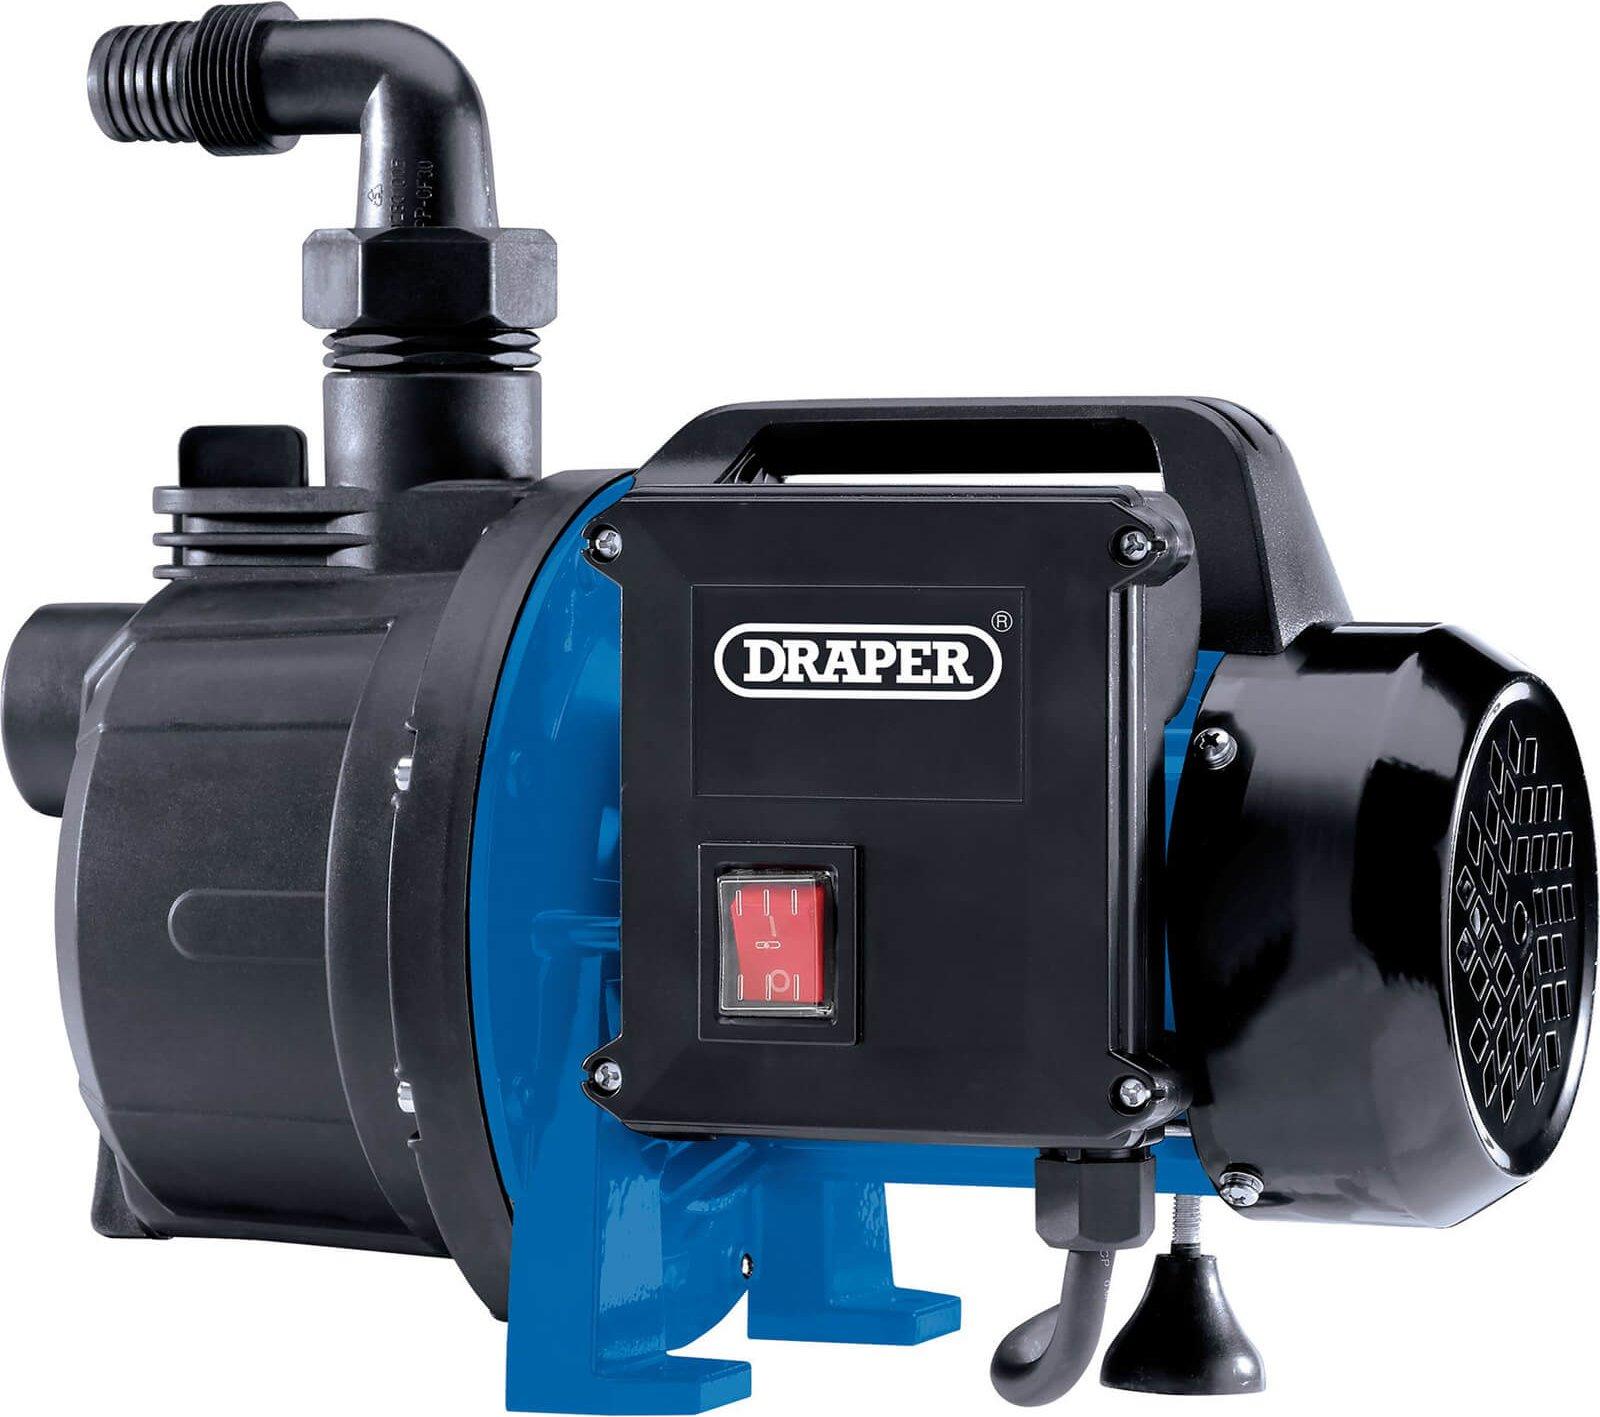 Draper SP53 Surface Water Pump 240v